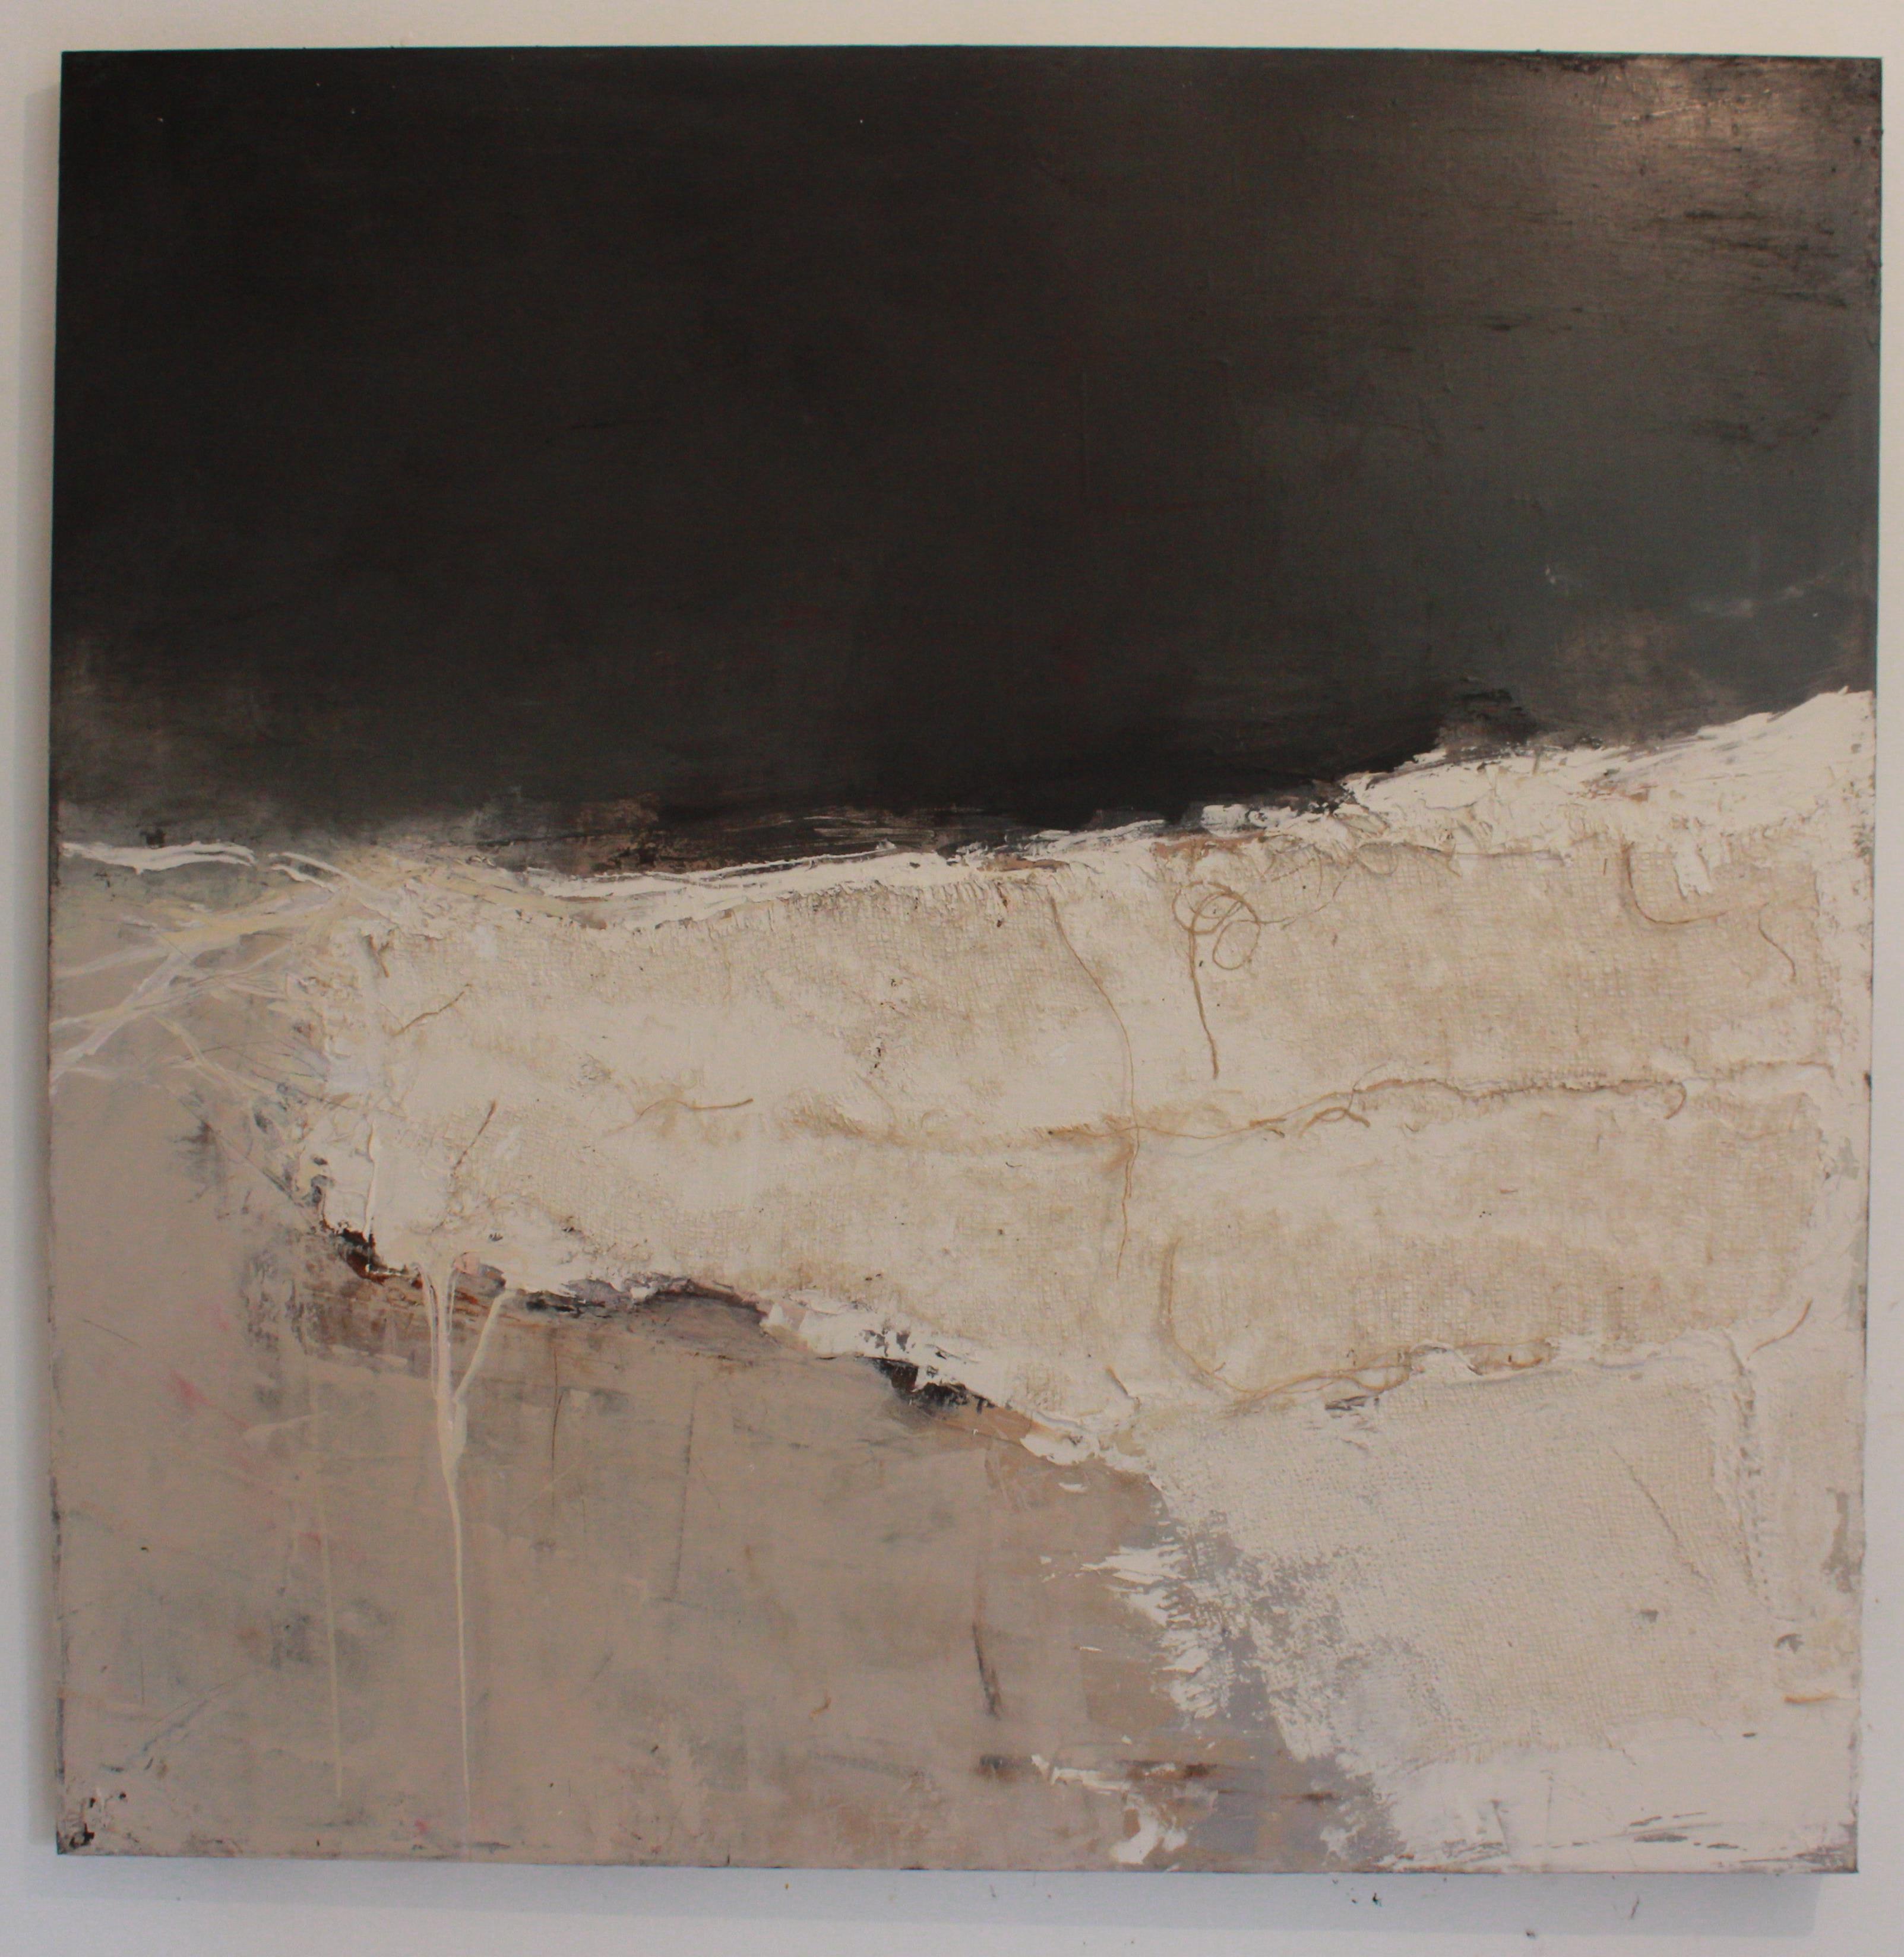 Jules Allan, Calendo, 100cmx100cm, oil and plaster on canvas